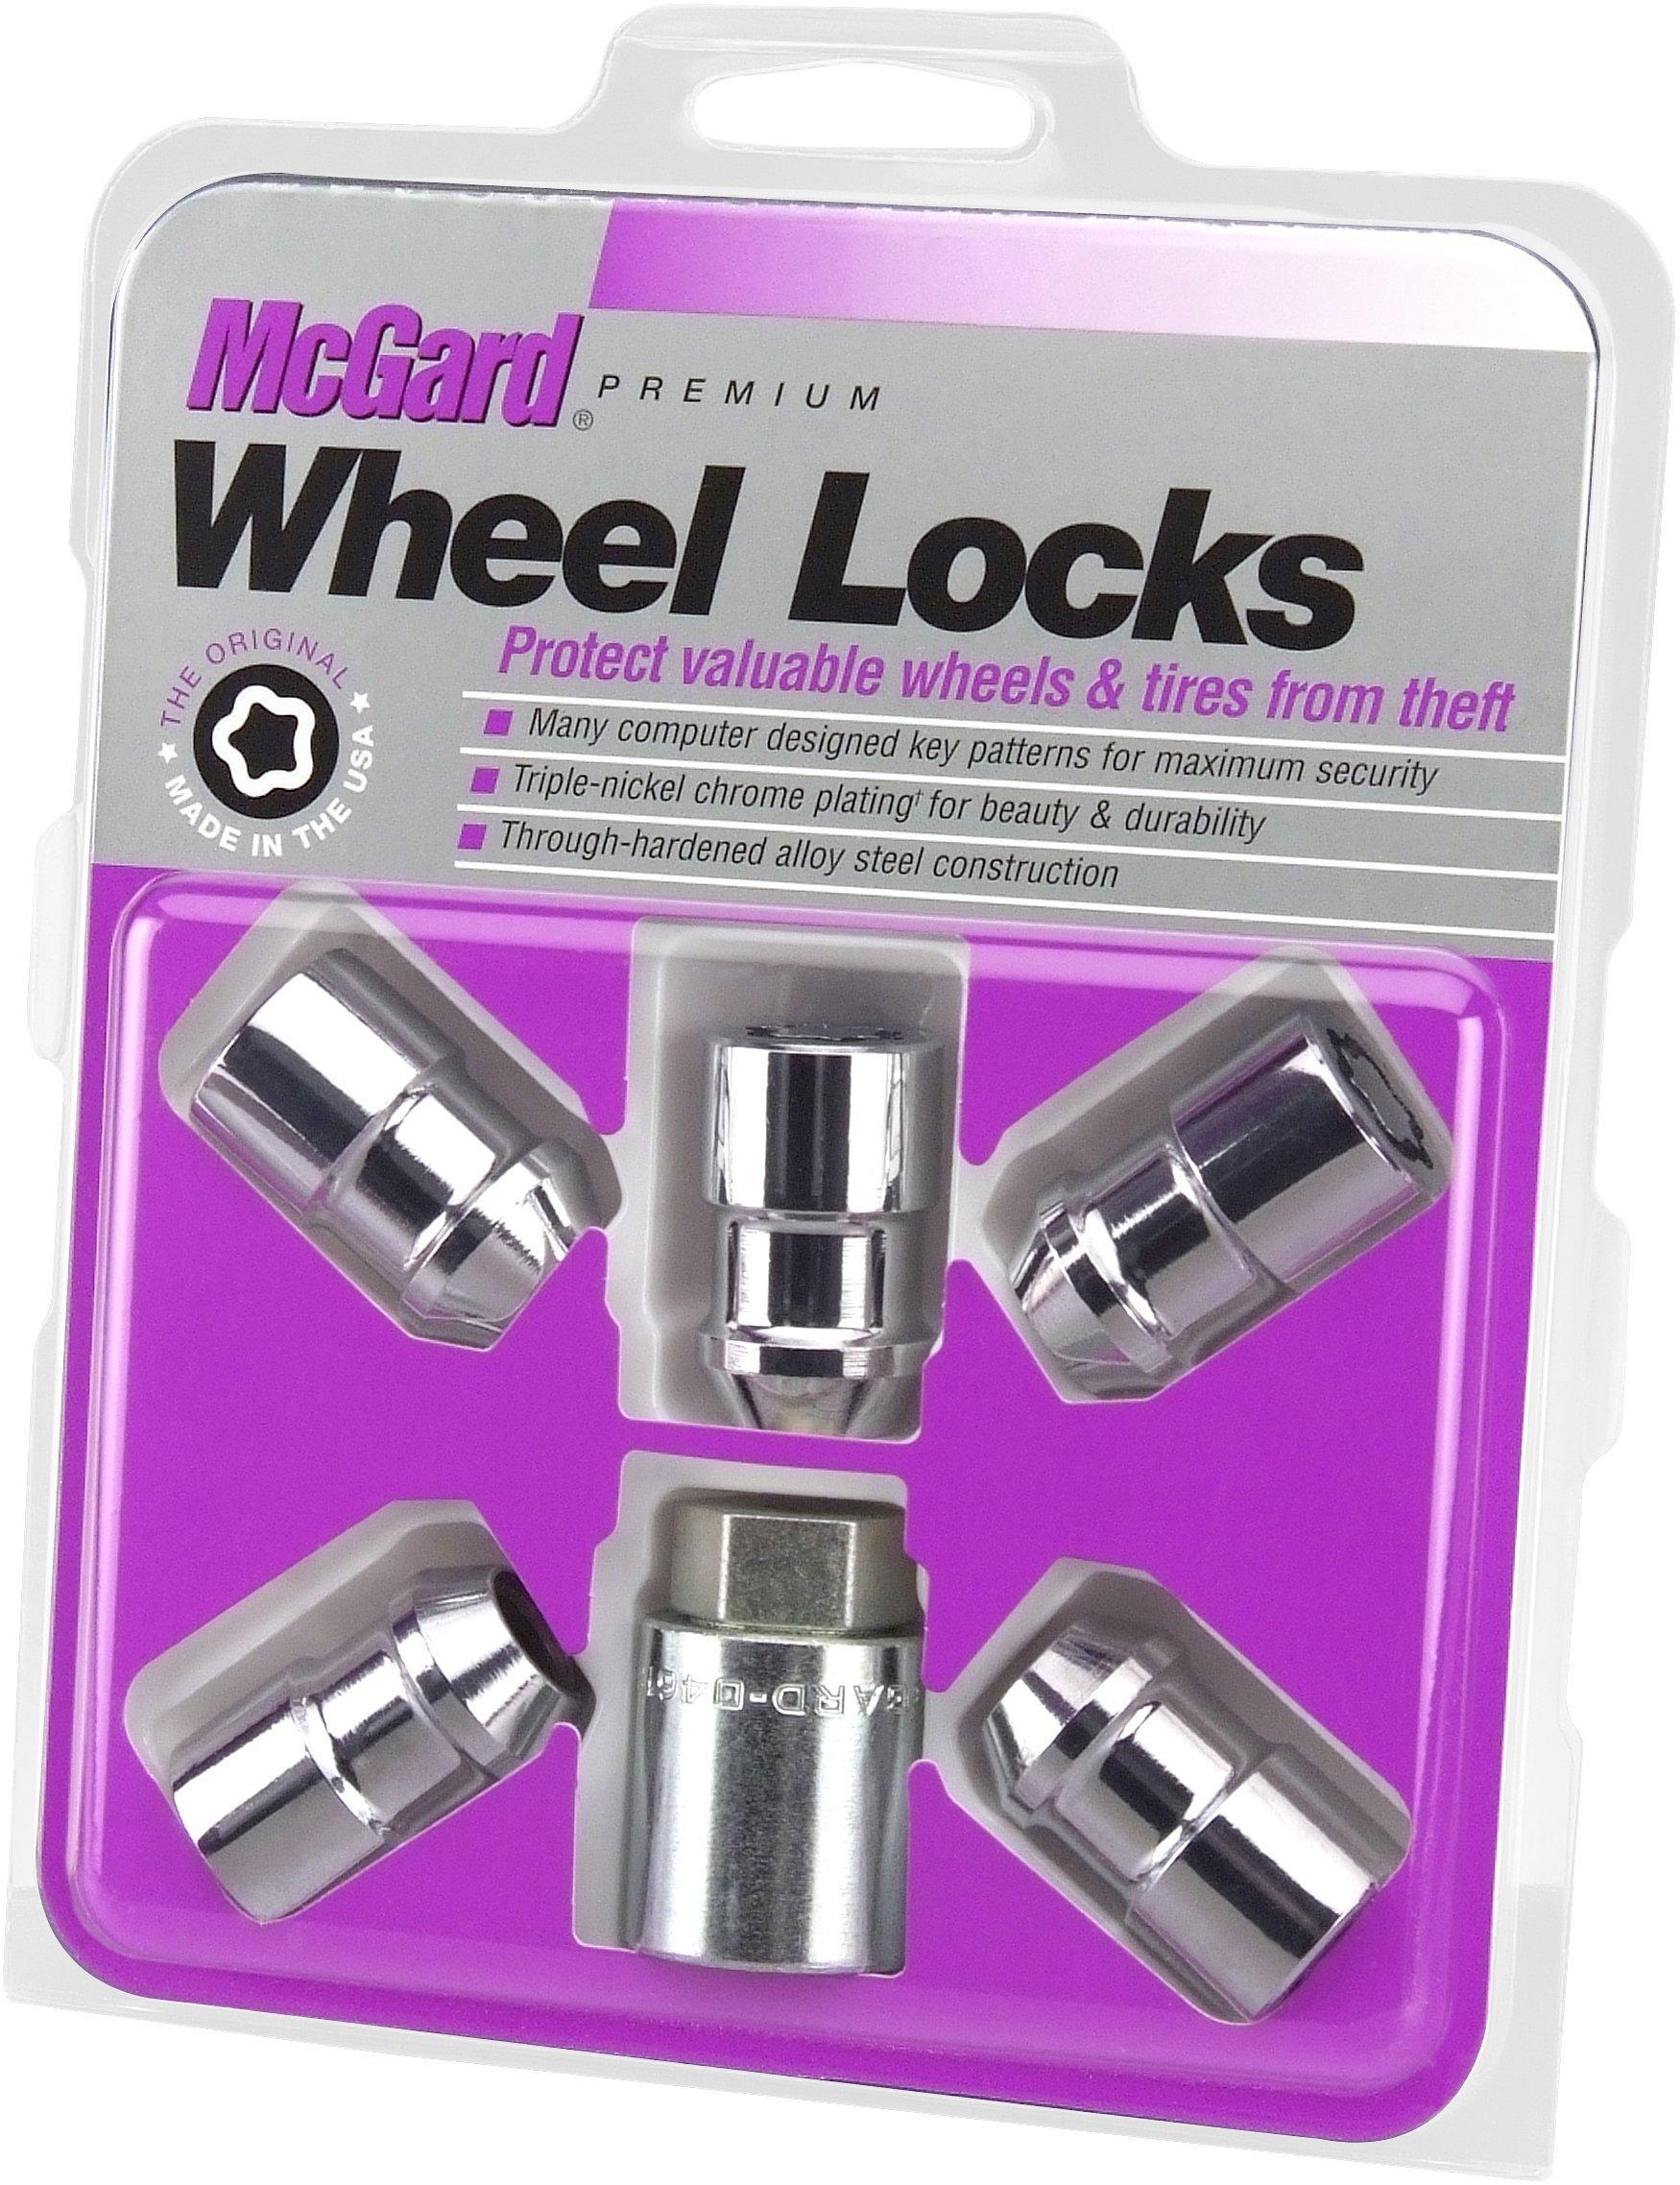 for 6 Lug Wheels 1//2-20 Thread Size McGard 84630 Chrome Cone Seat Wheel Installation Kit